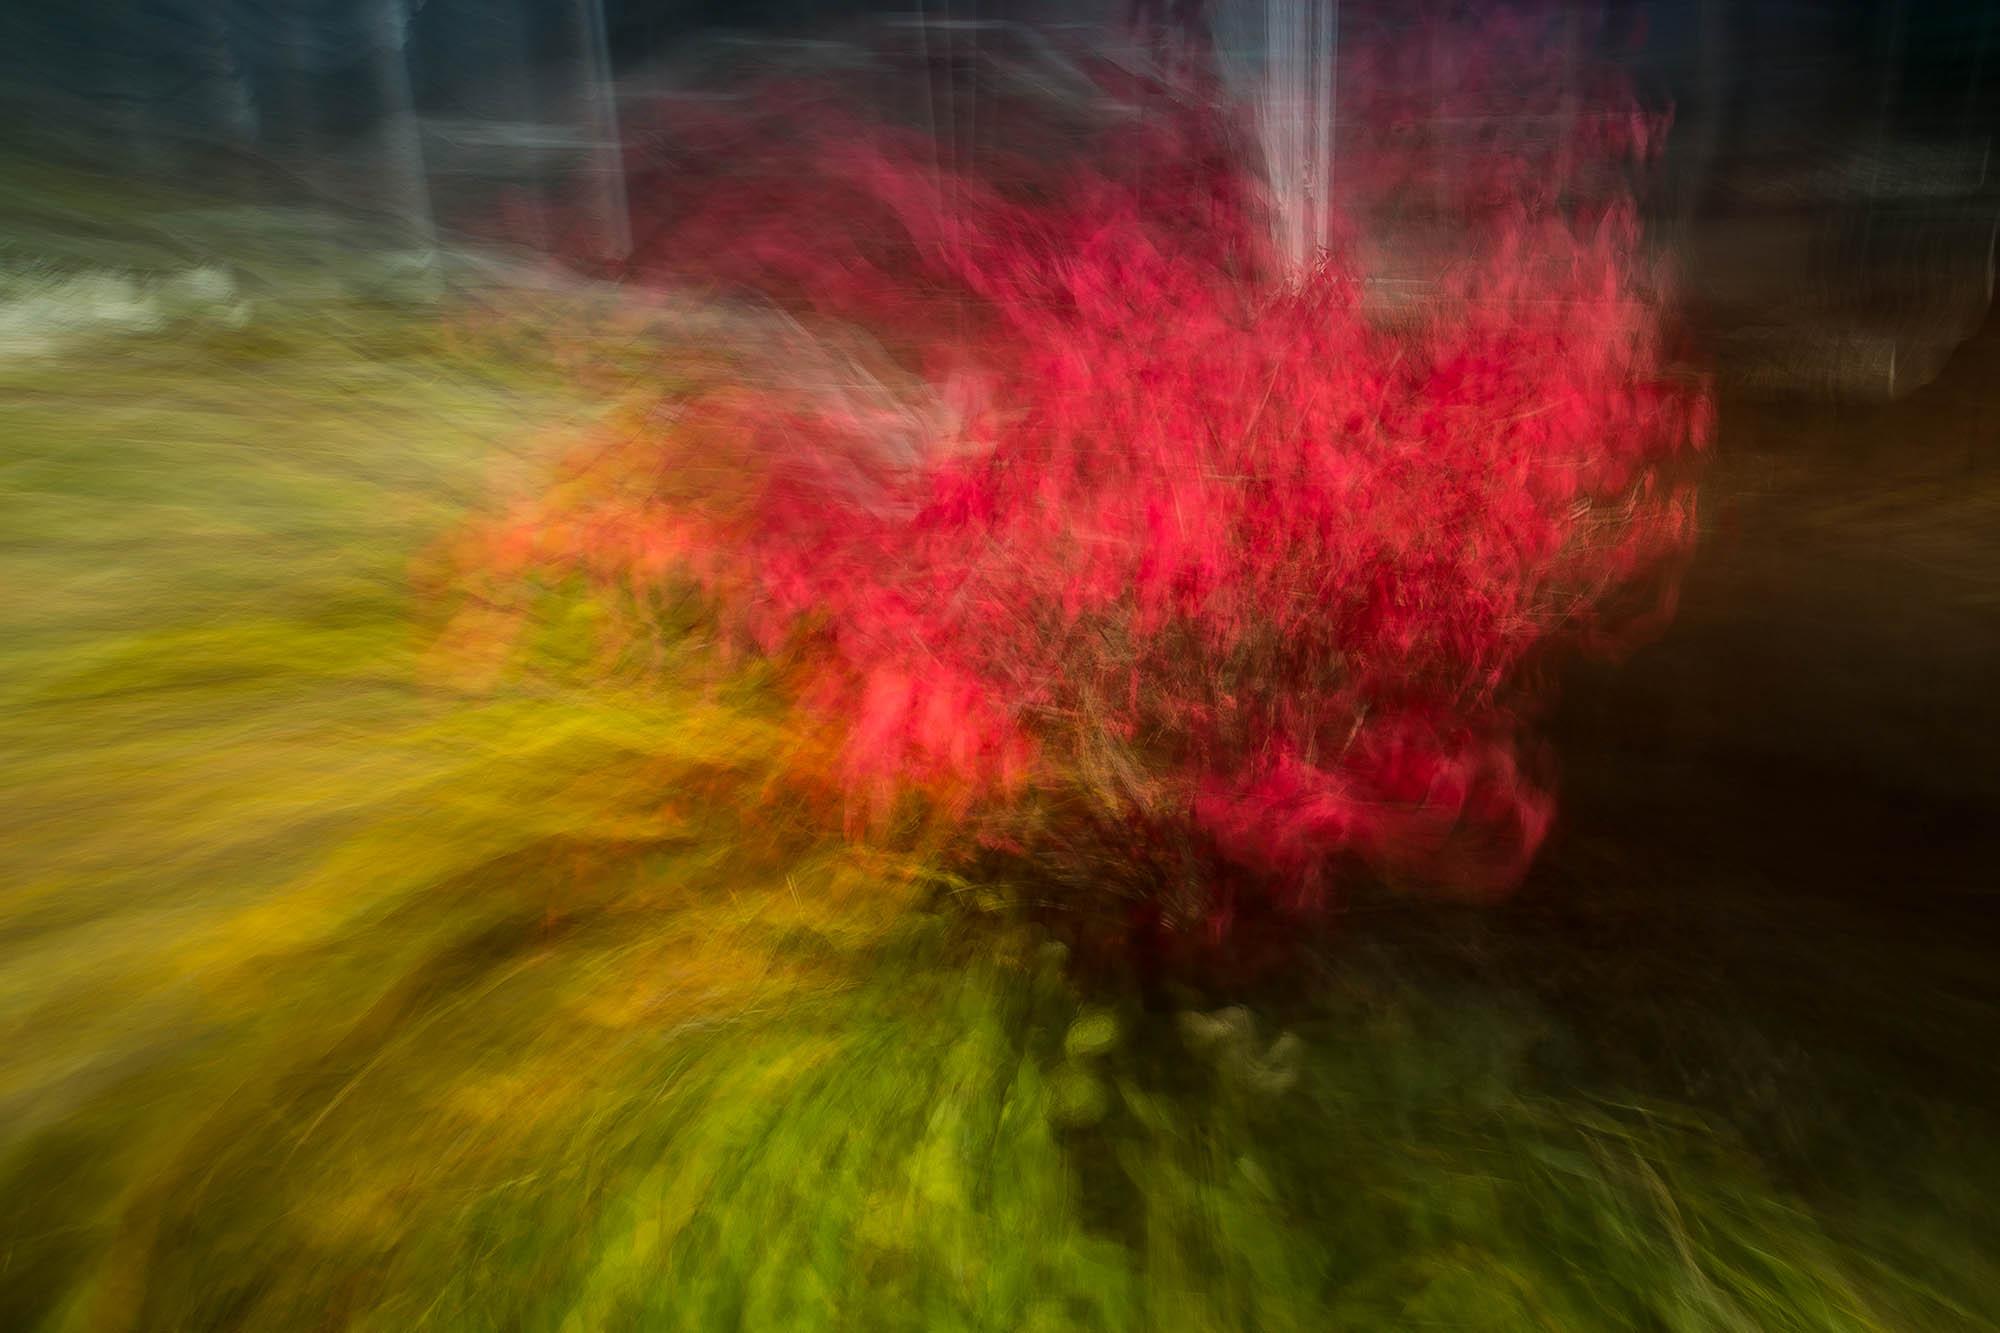 Burning Bush- Jordan-11-2015-1N6A5447.jpg